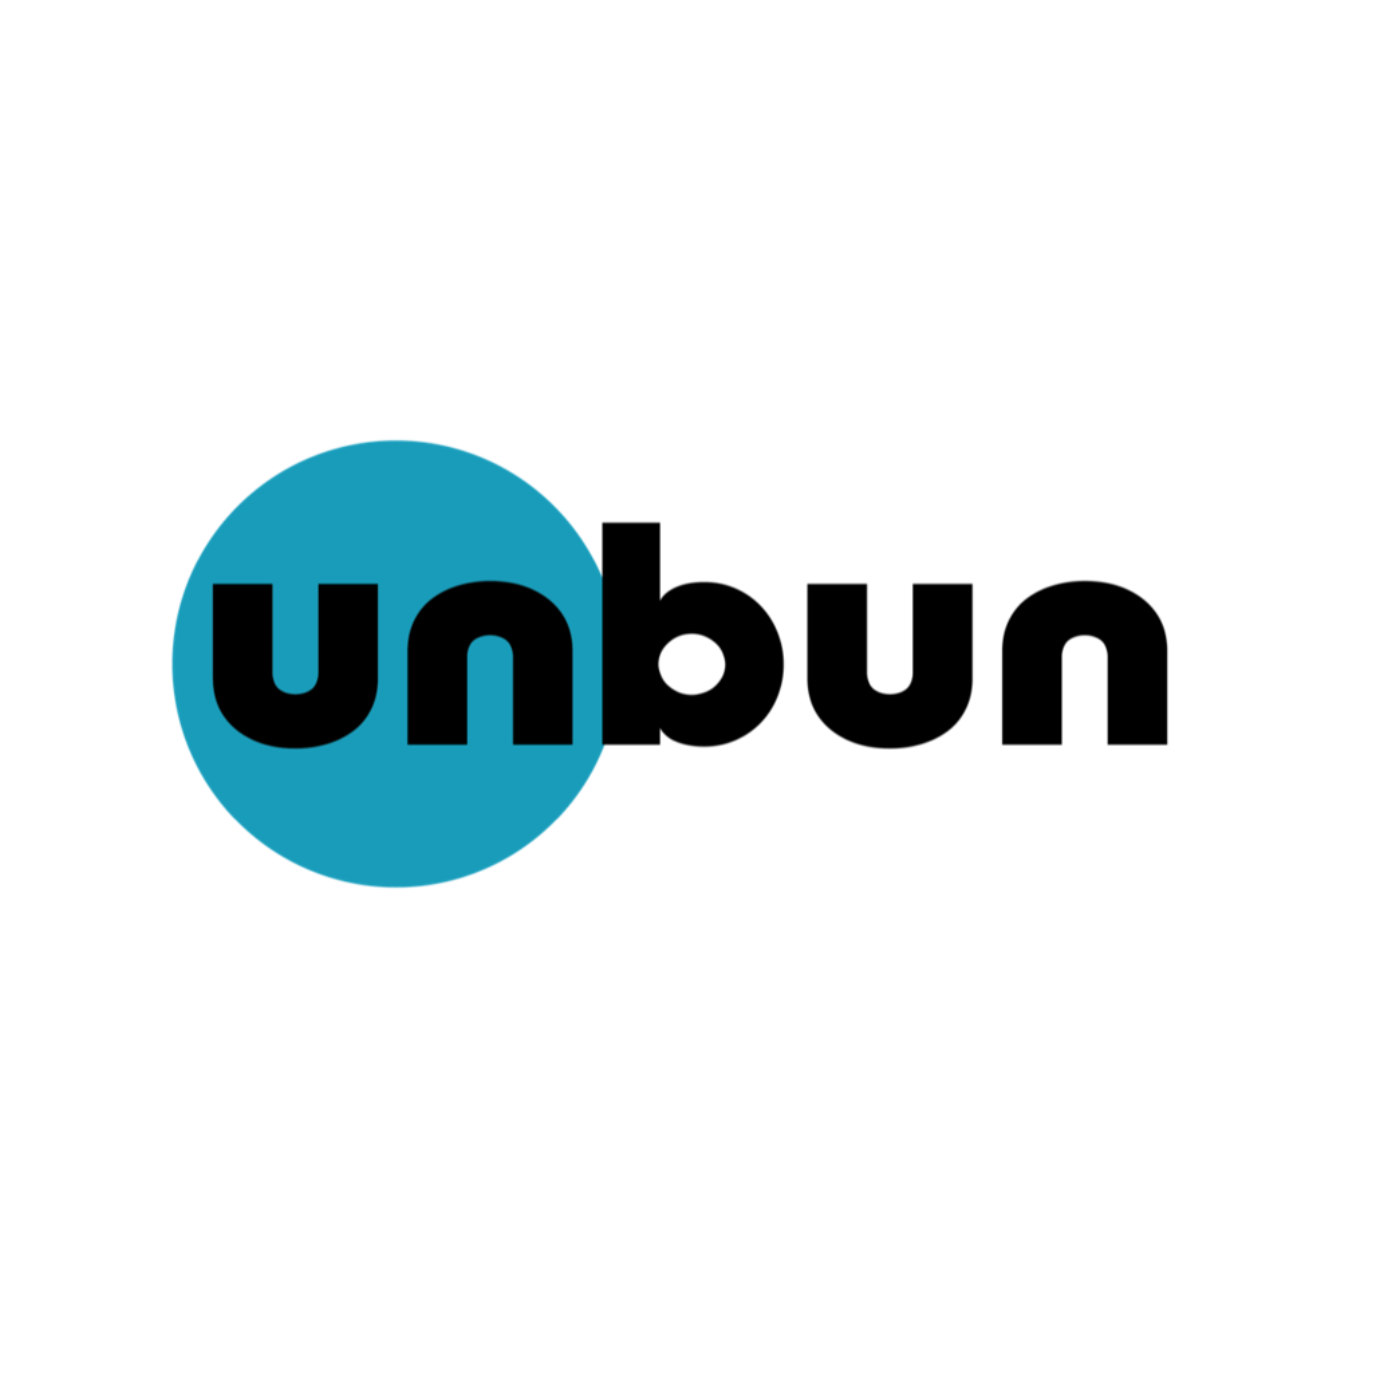 Unbun Foods - Certified Grain Free Gluten Free, Certified Paleo, PaleoVegan, KETO Certified by the Paleo Foundation